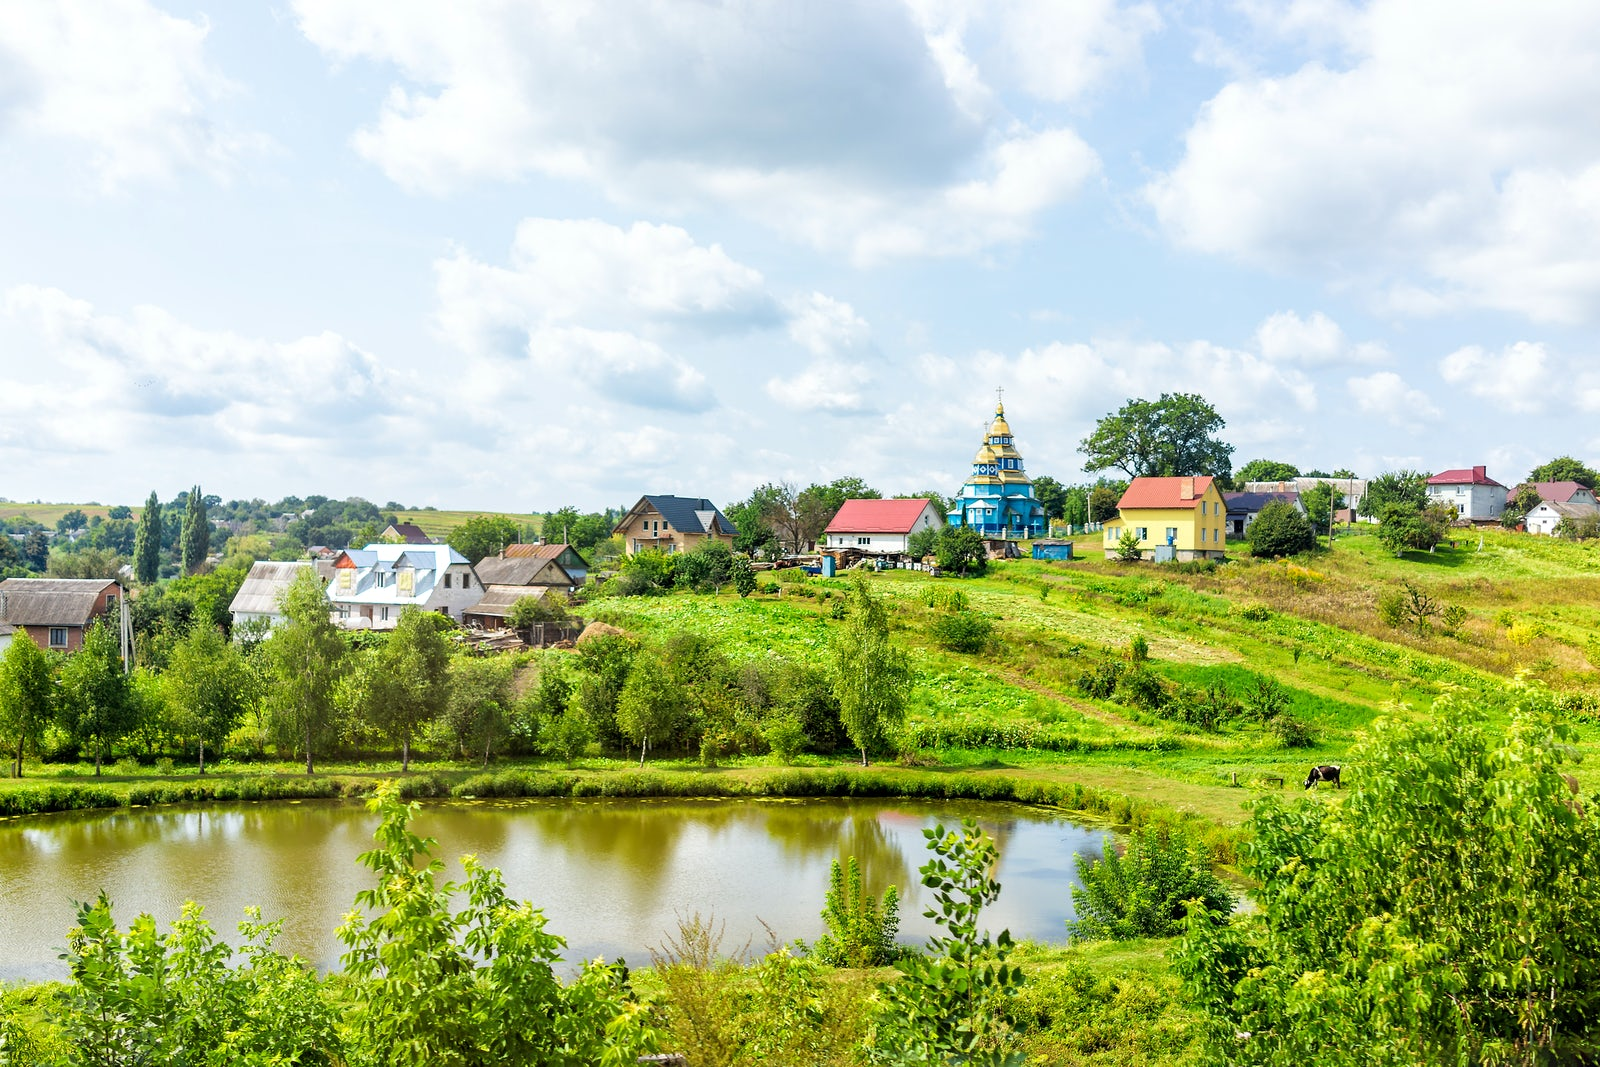 Foto © Créditos a iStock/krblokhin